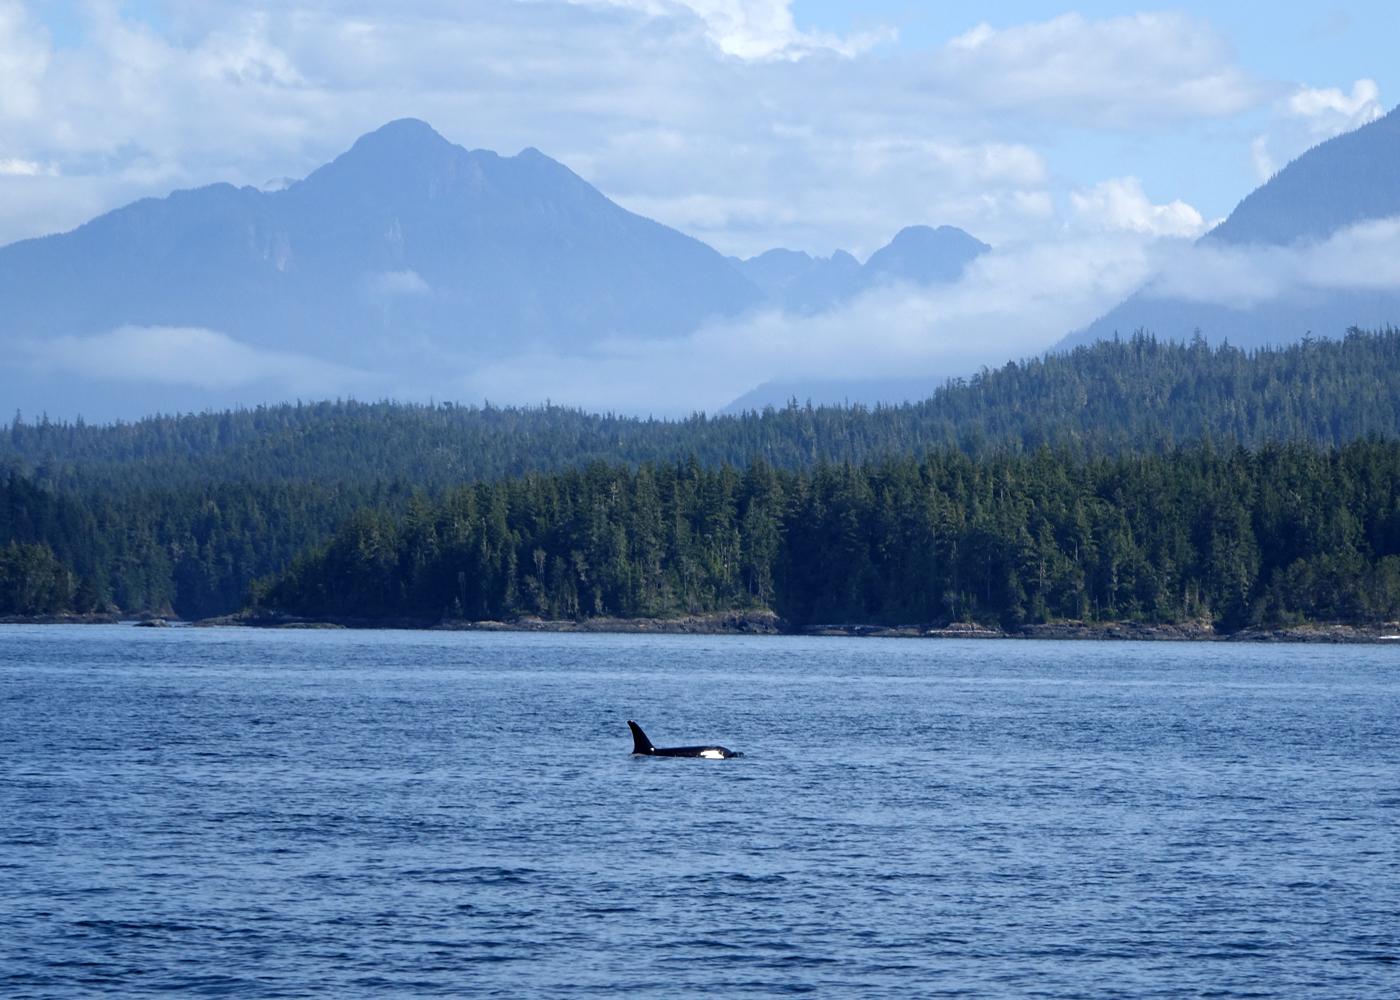 Orcas Island Sailing Club